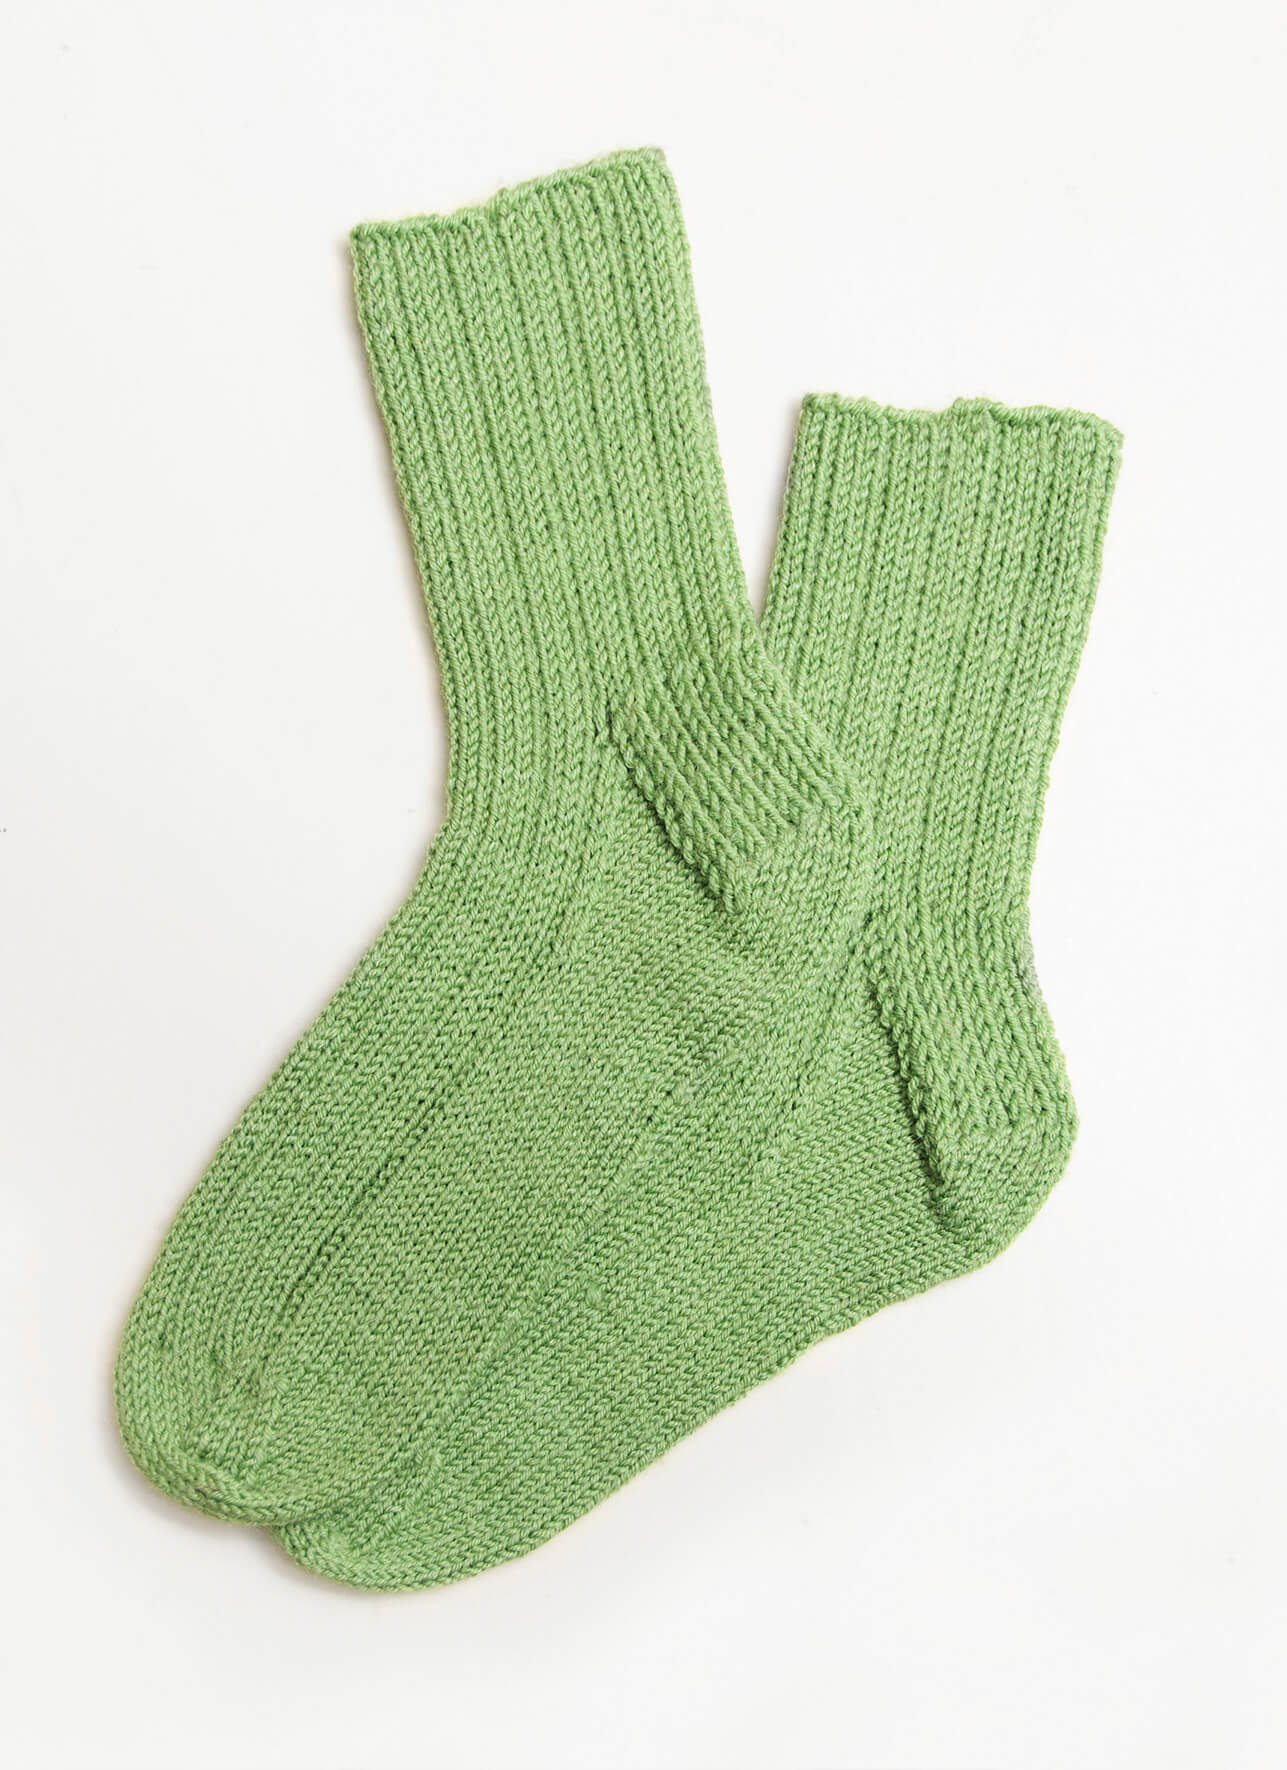 Ribbed Socks for Kids - Blue Sky Fibers